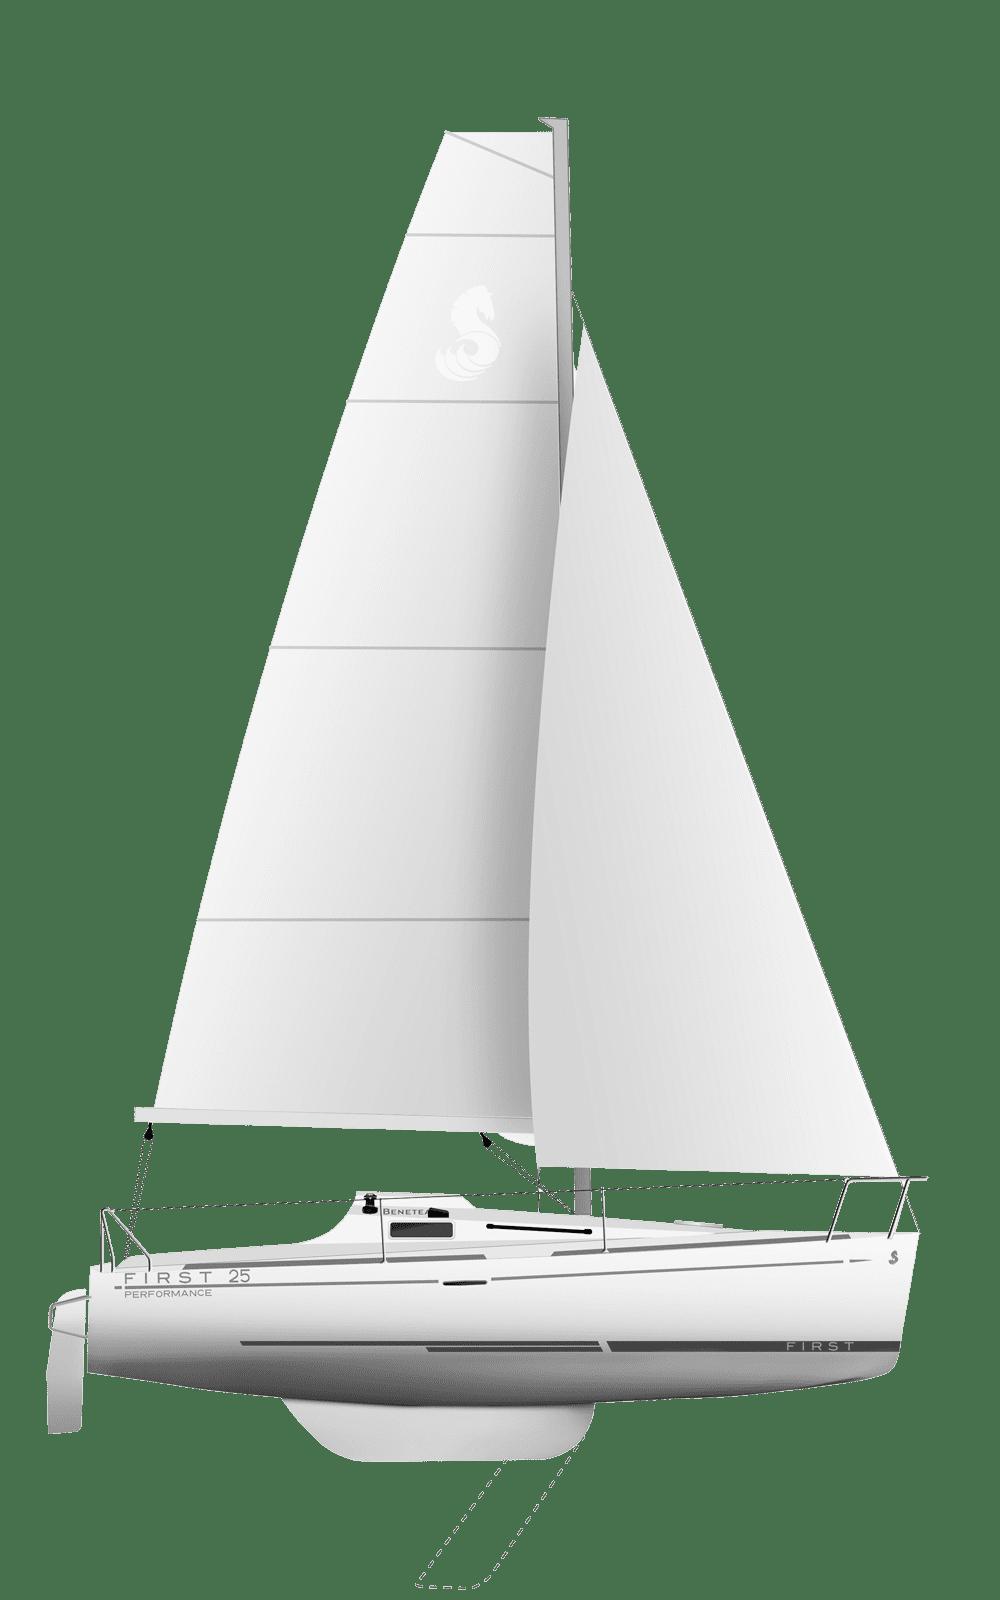 Beneteau First Range Line Drawing